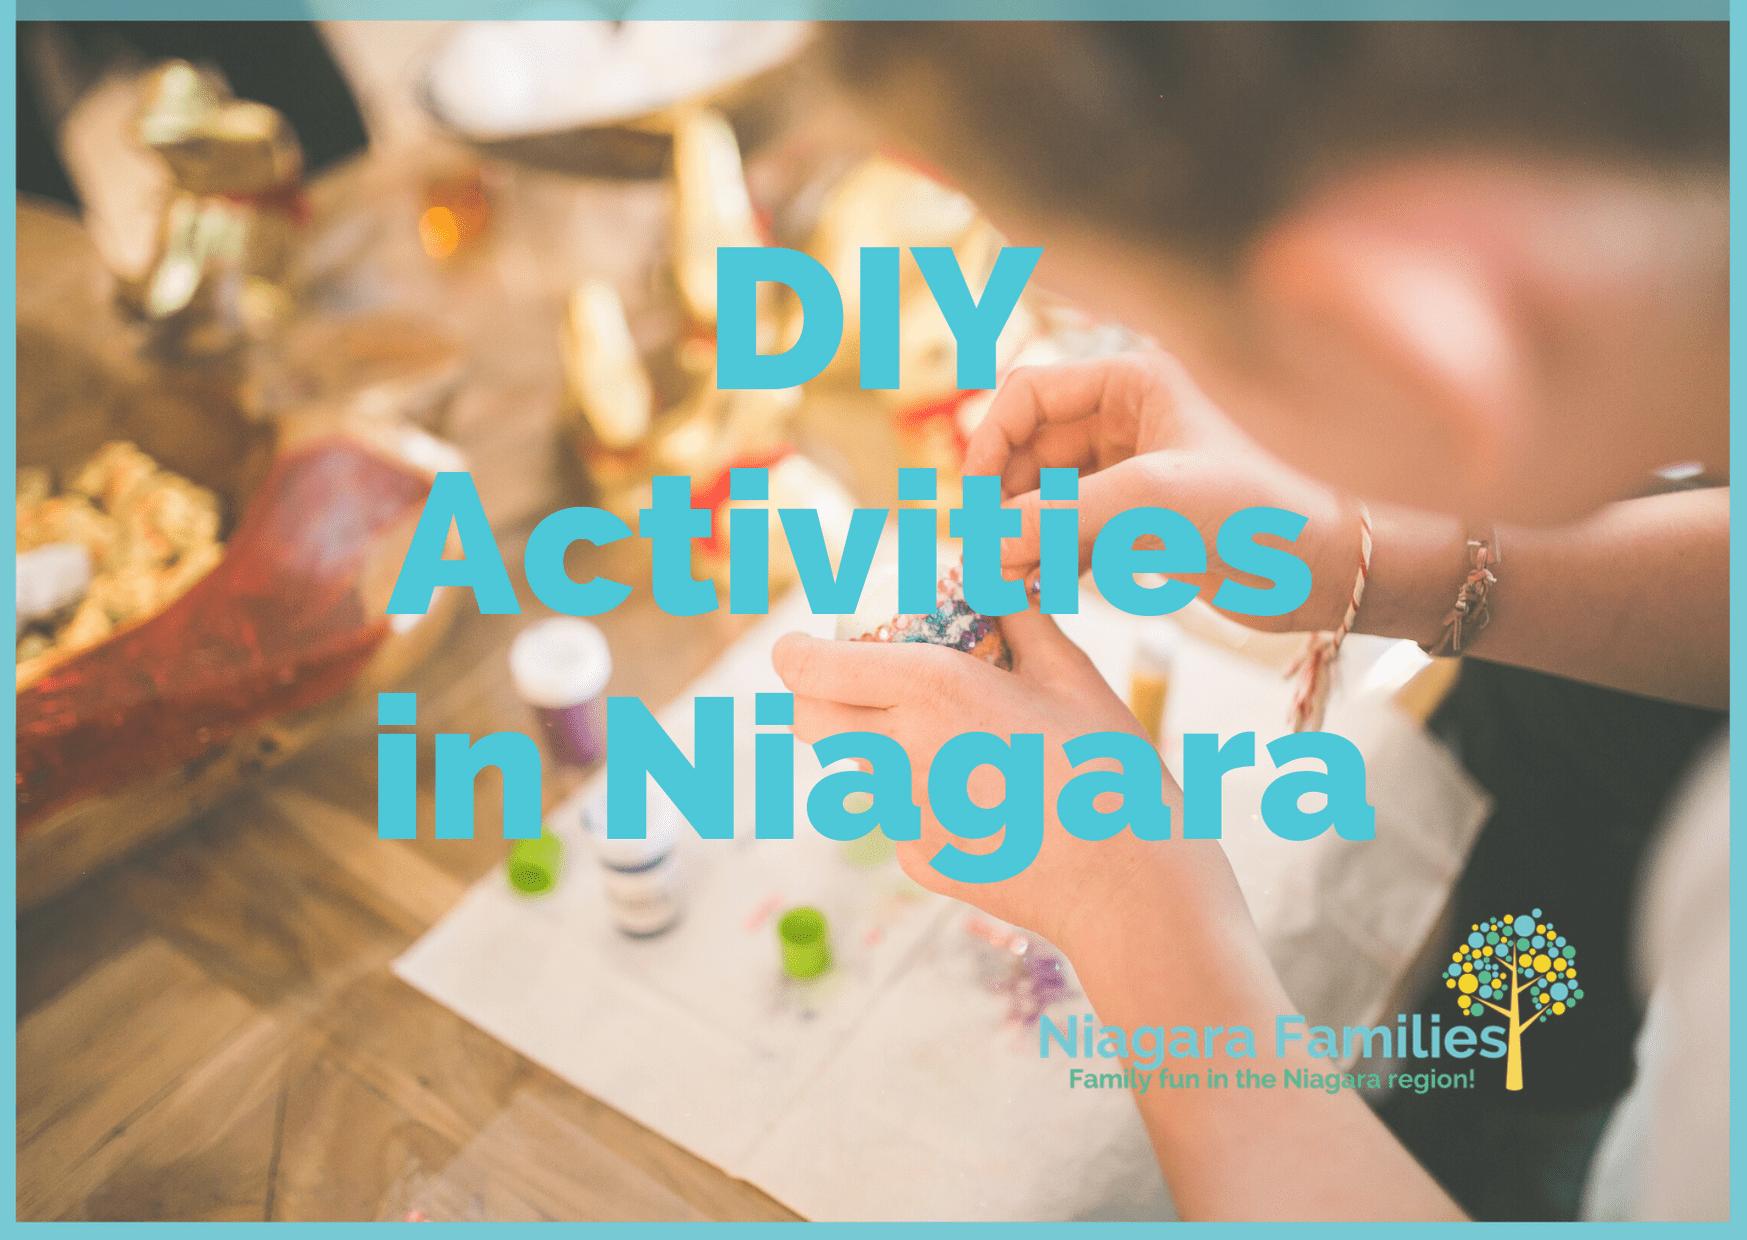 diy activities in niagara